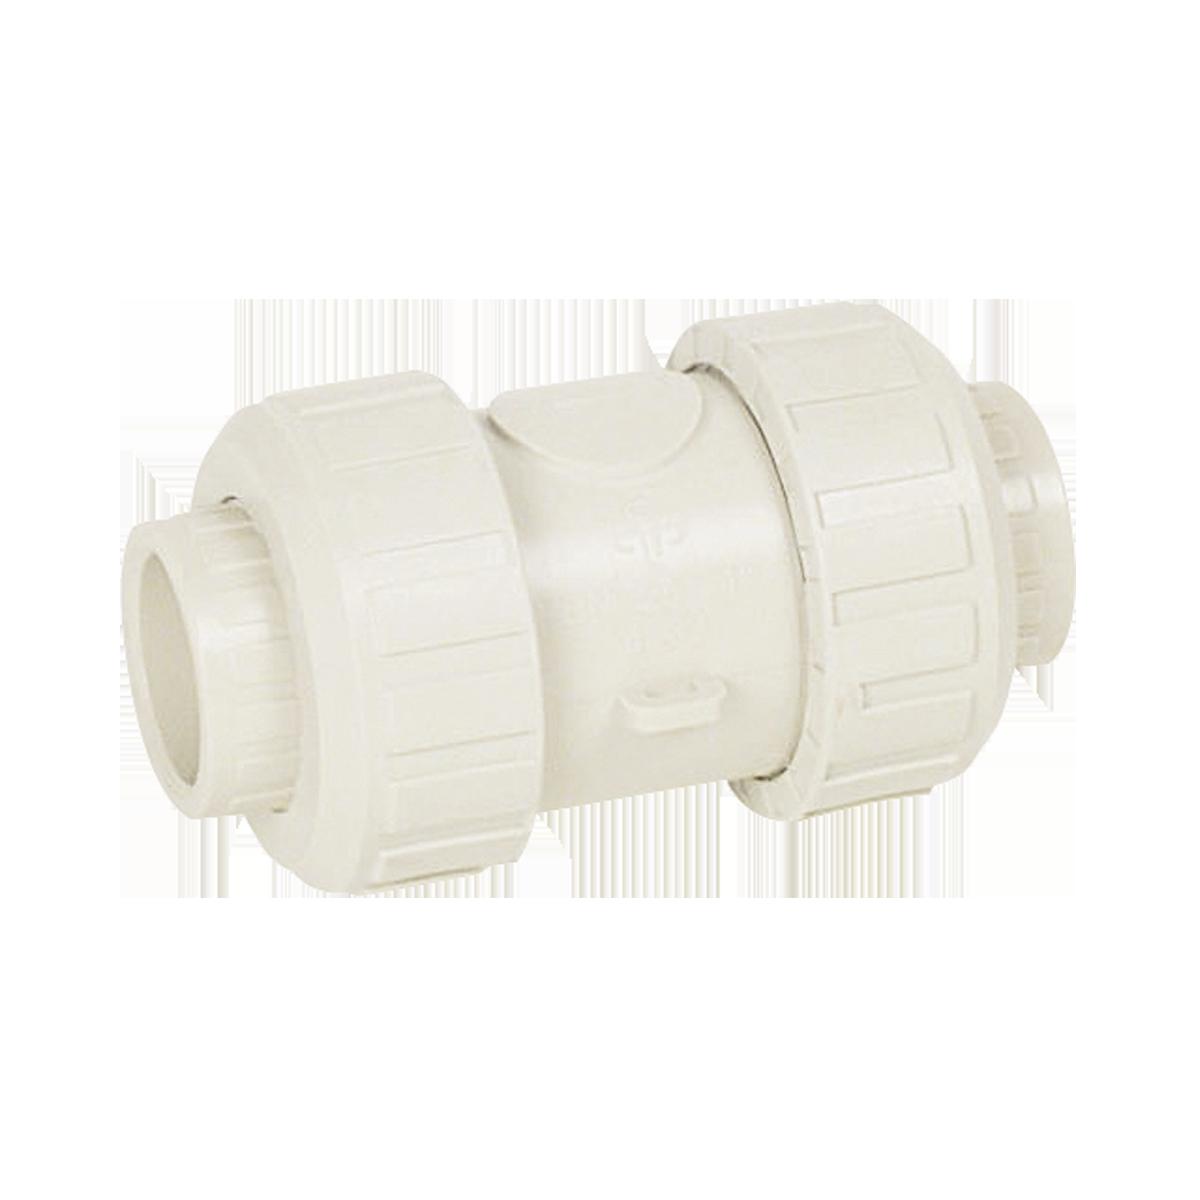 Praher cone check valve S4 PP, beige